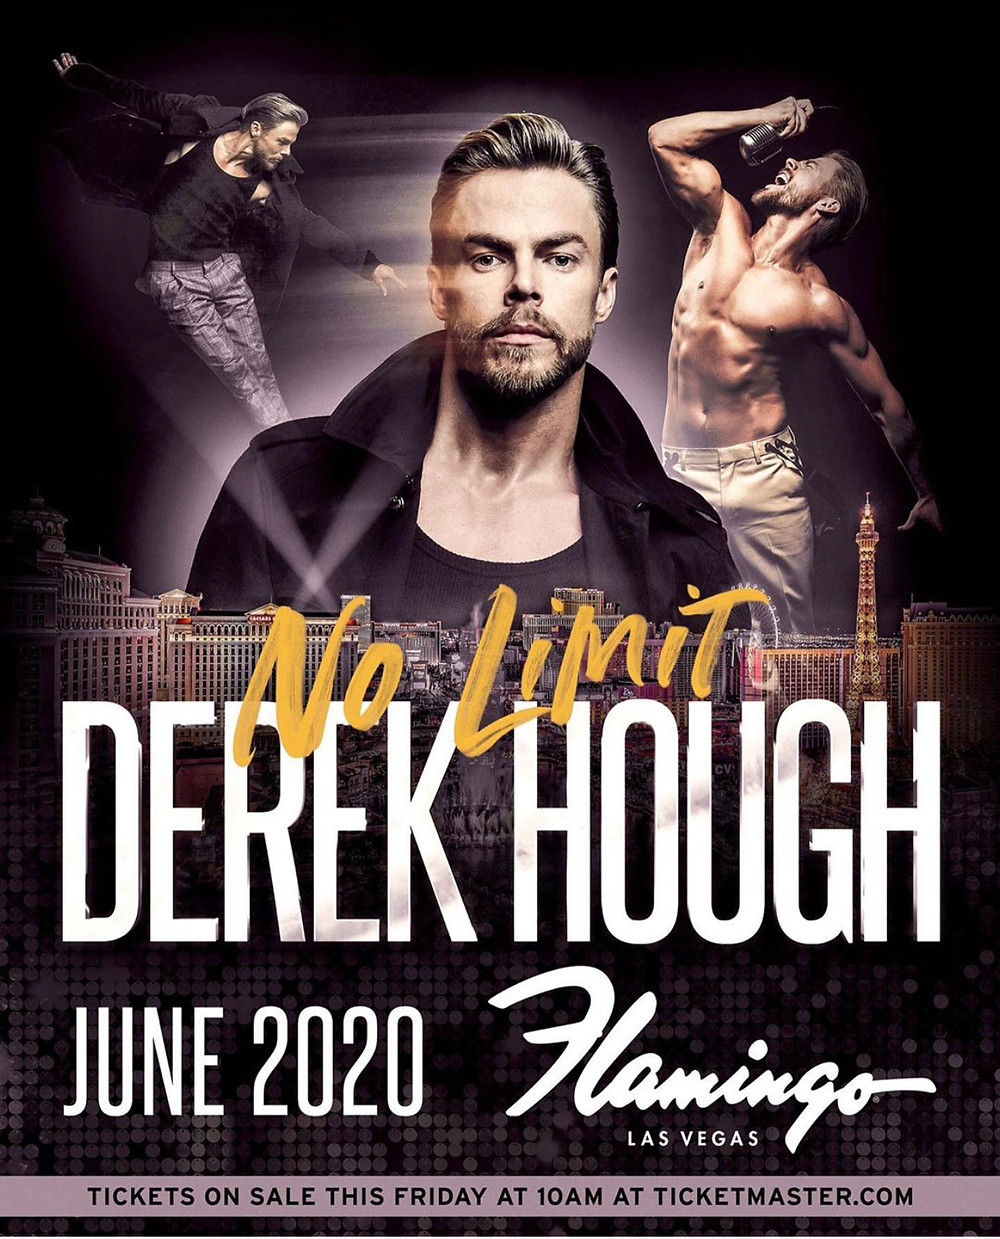 Derek-Hough-No-Limit-las-vegas